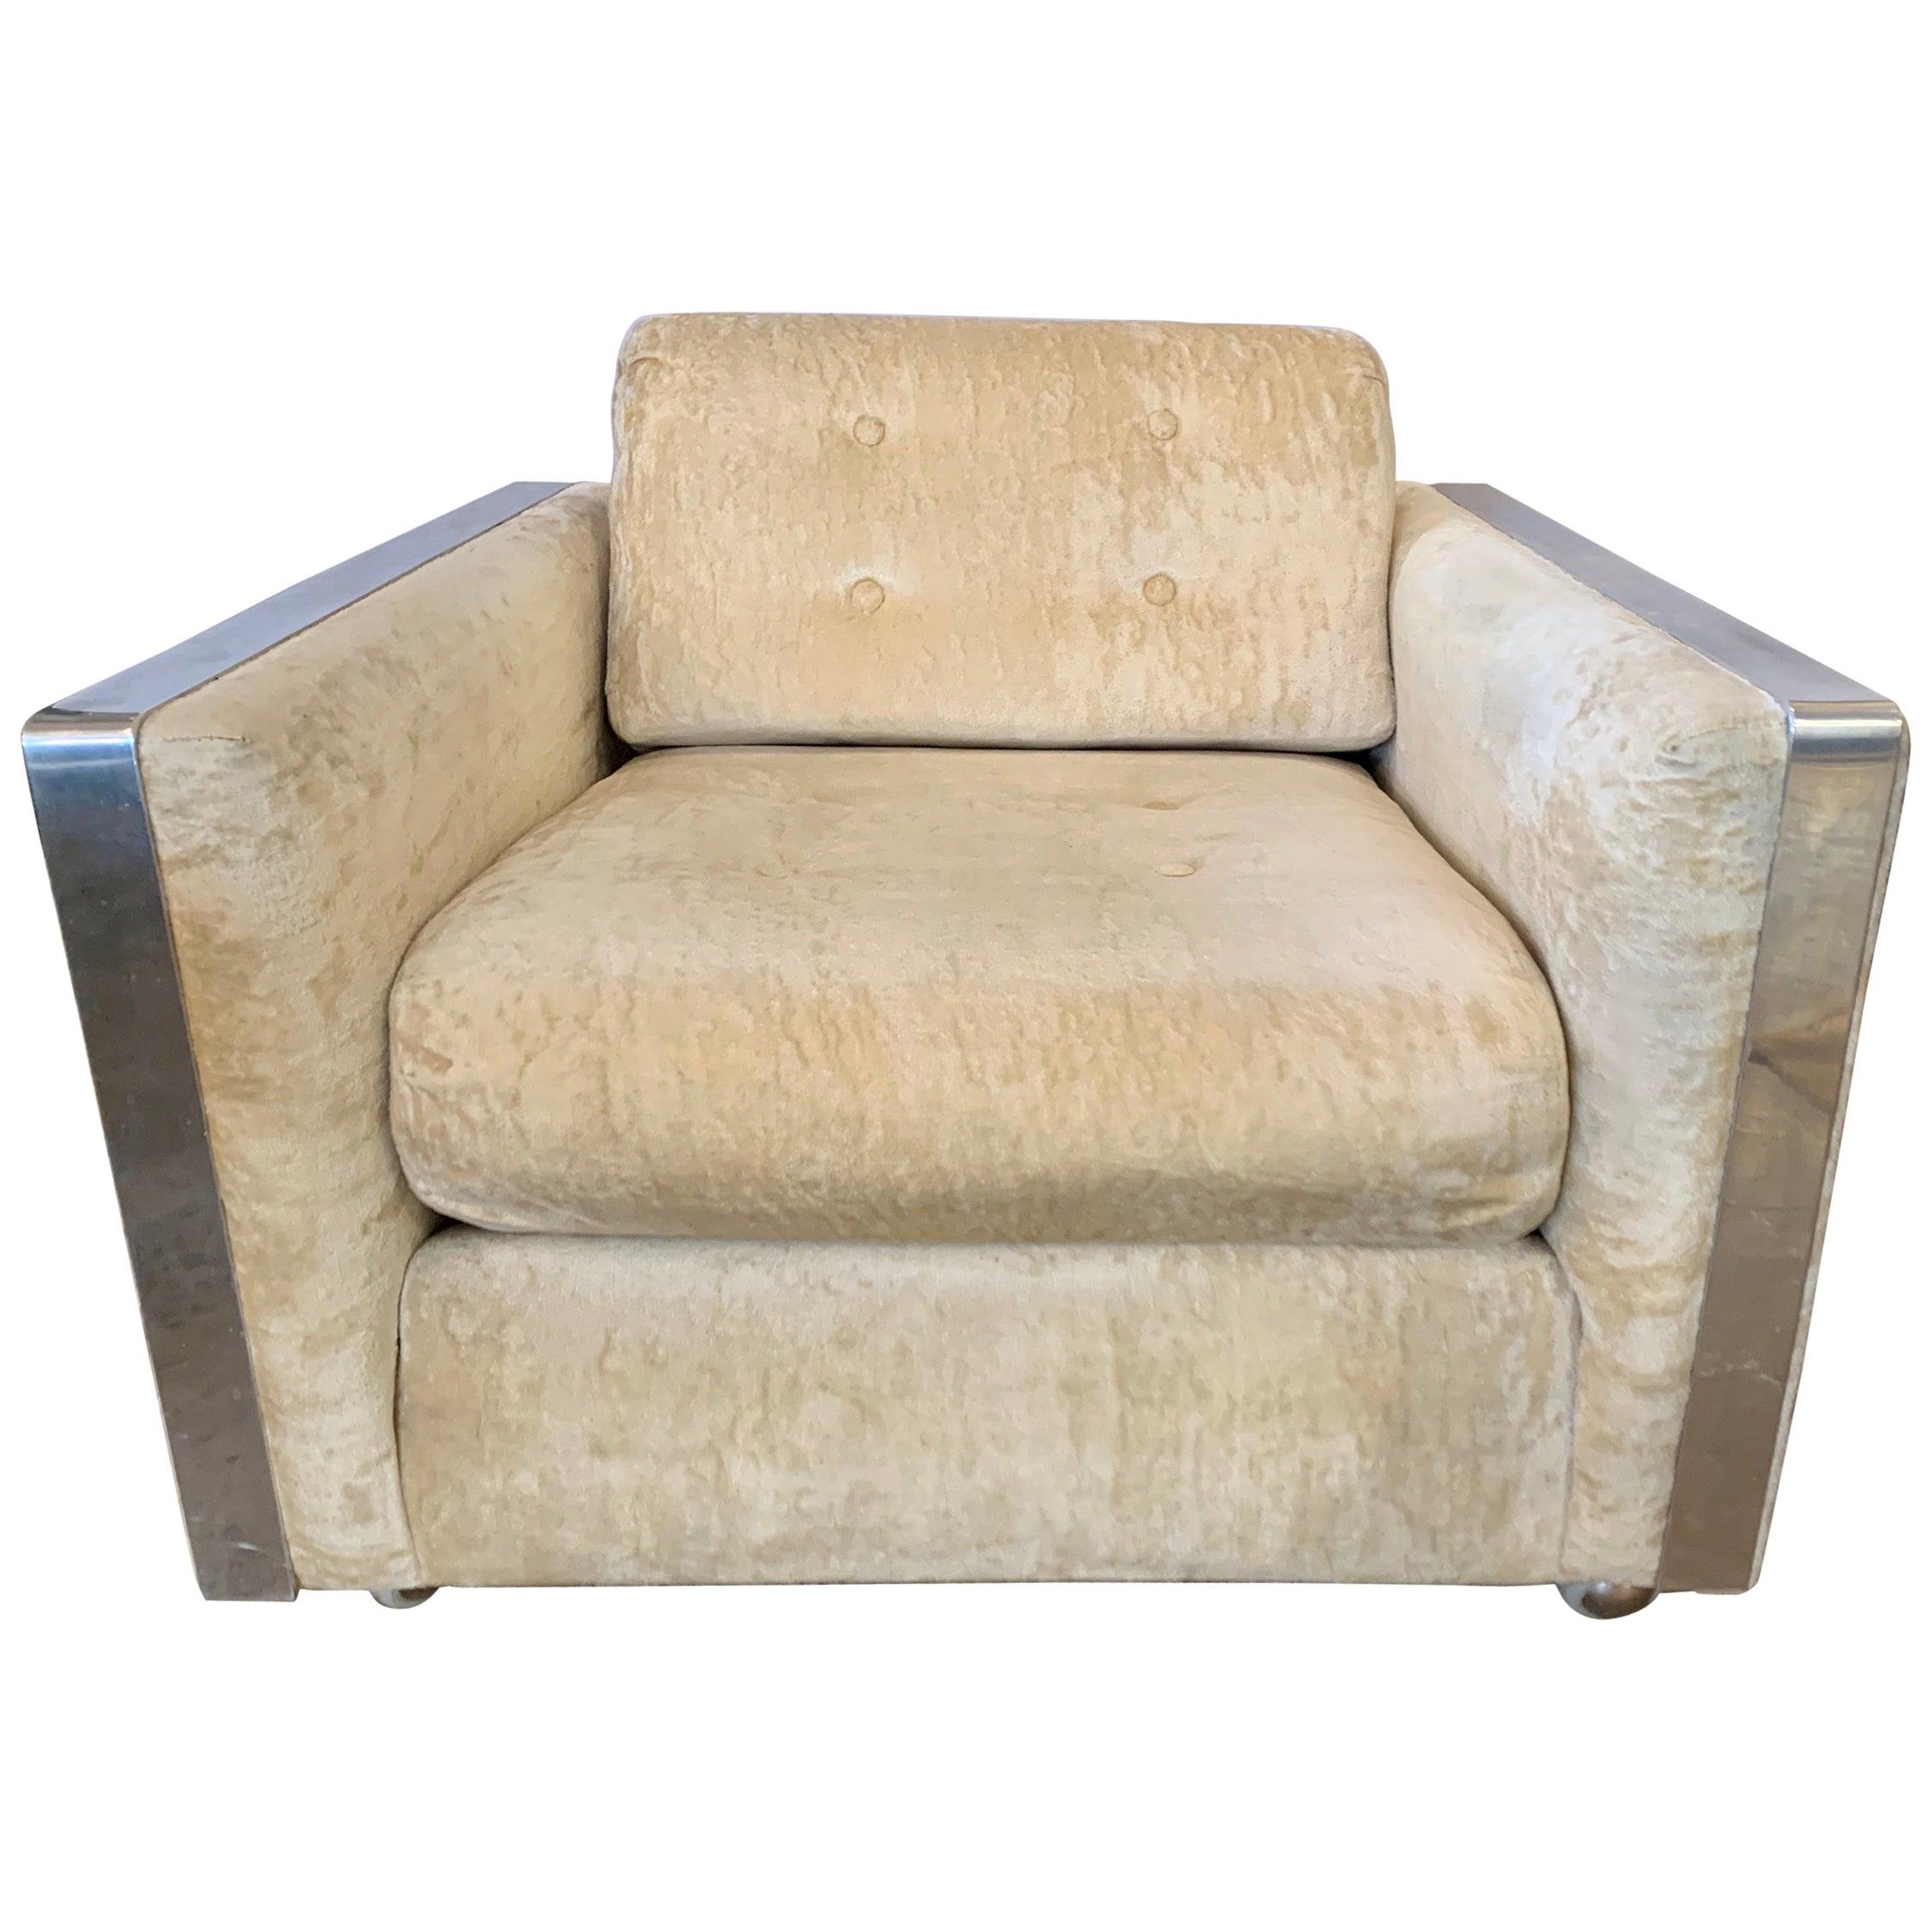 Mid-Century Modern Cubist Chrome and Velvet Fabric Lounge Chair